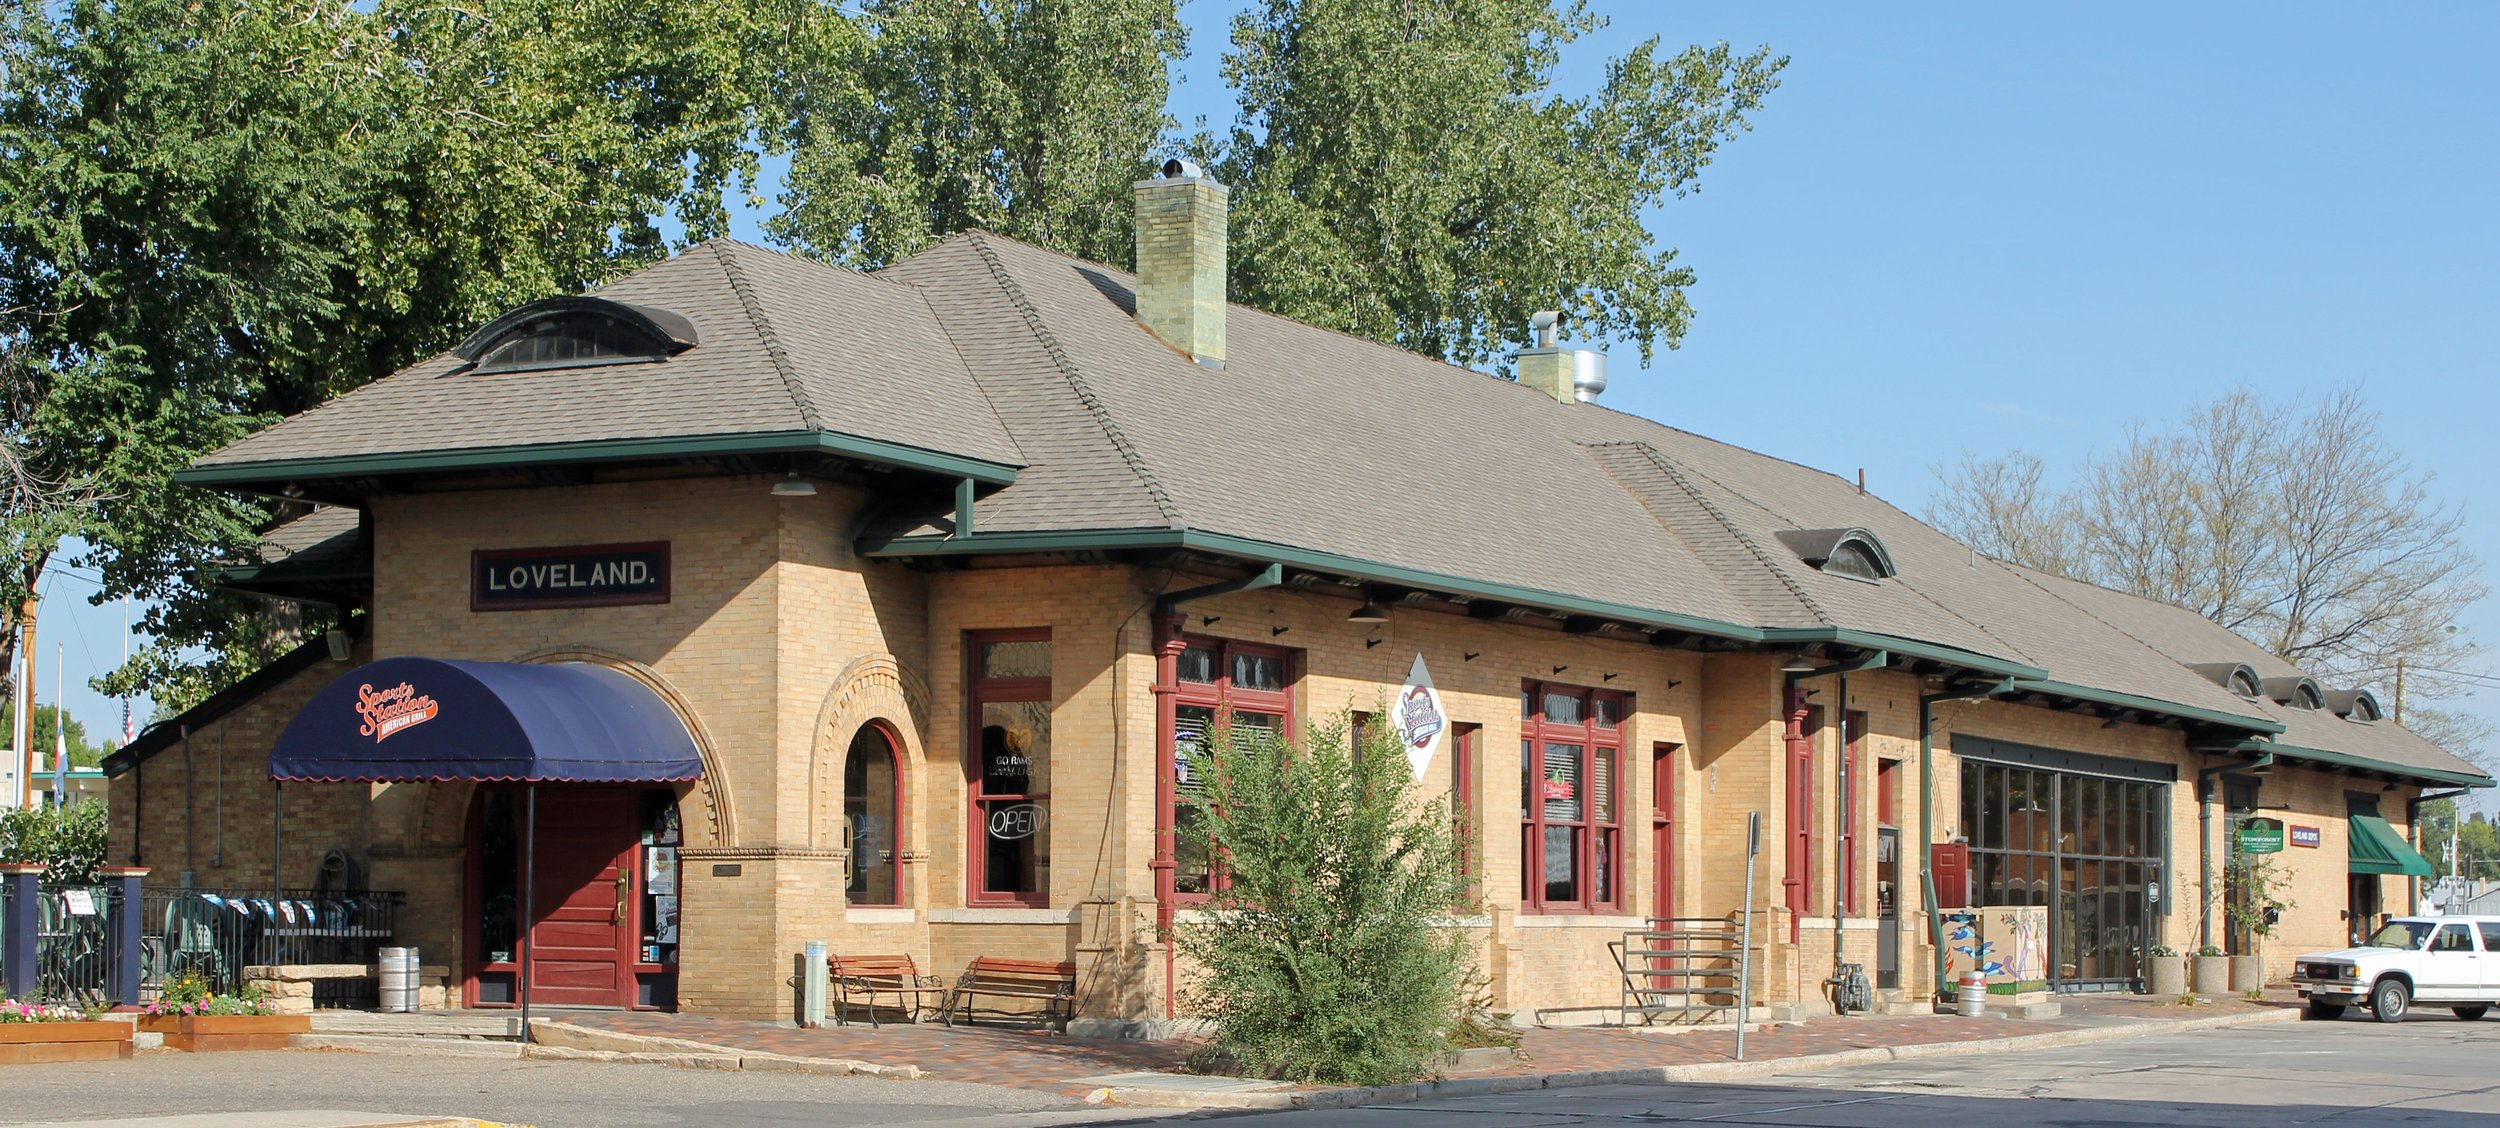 Colorado_and_Southern_Railway_Depot_Loveland_Colorado-min.jpg